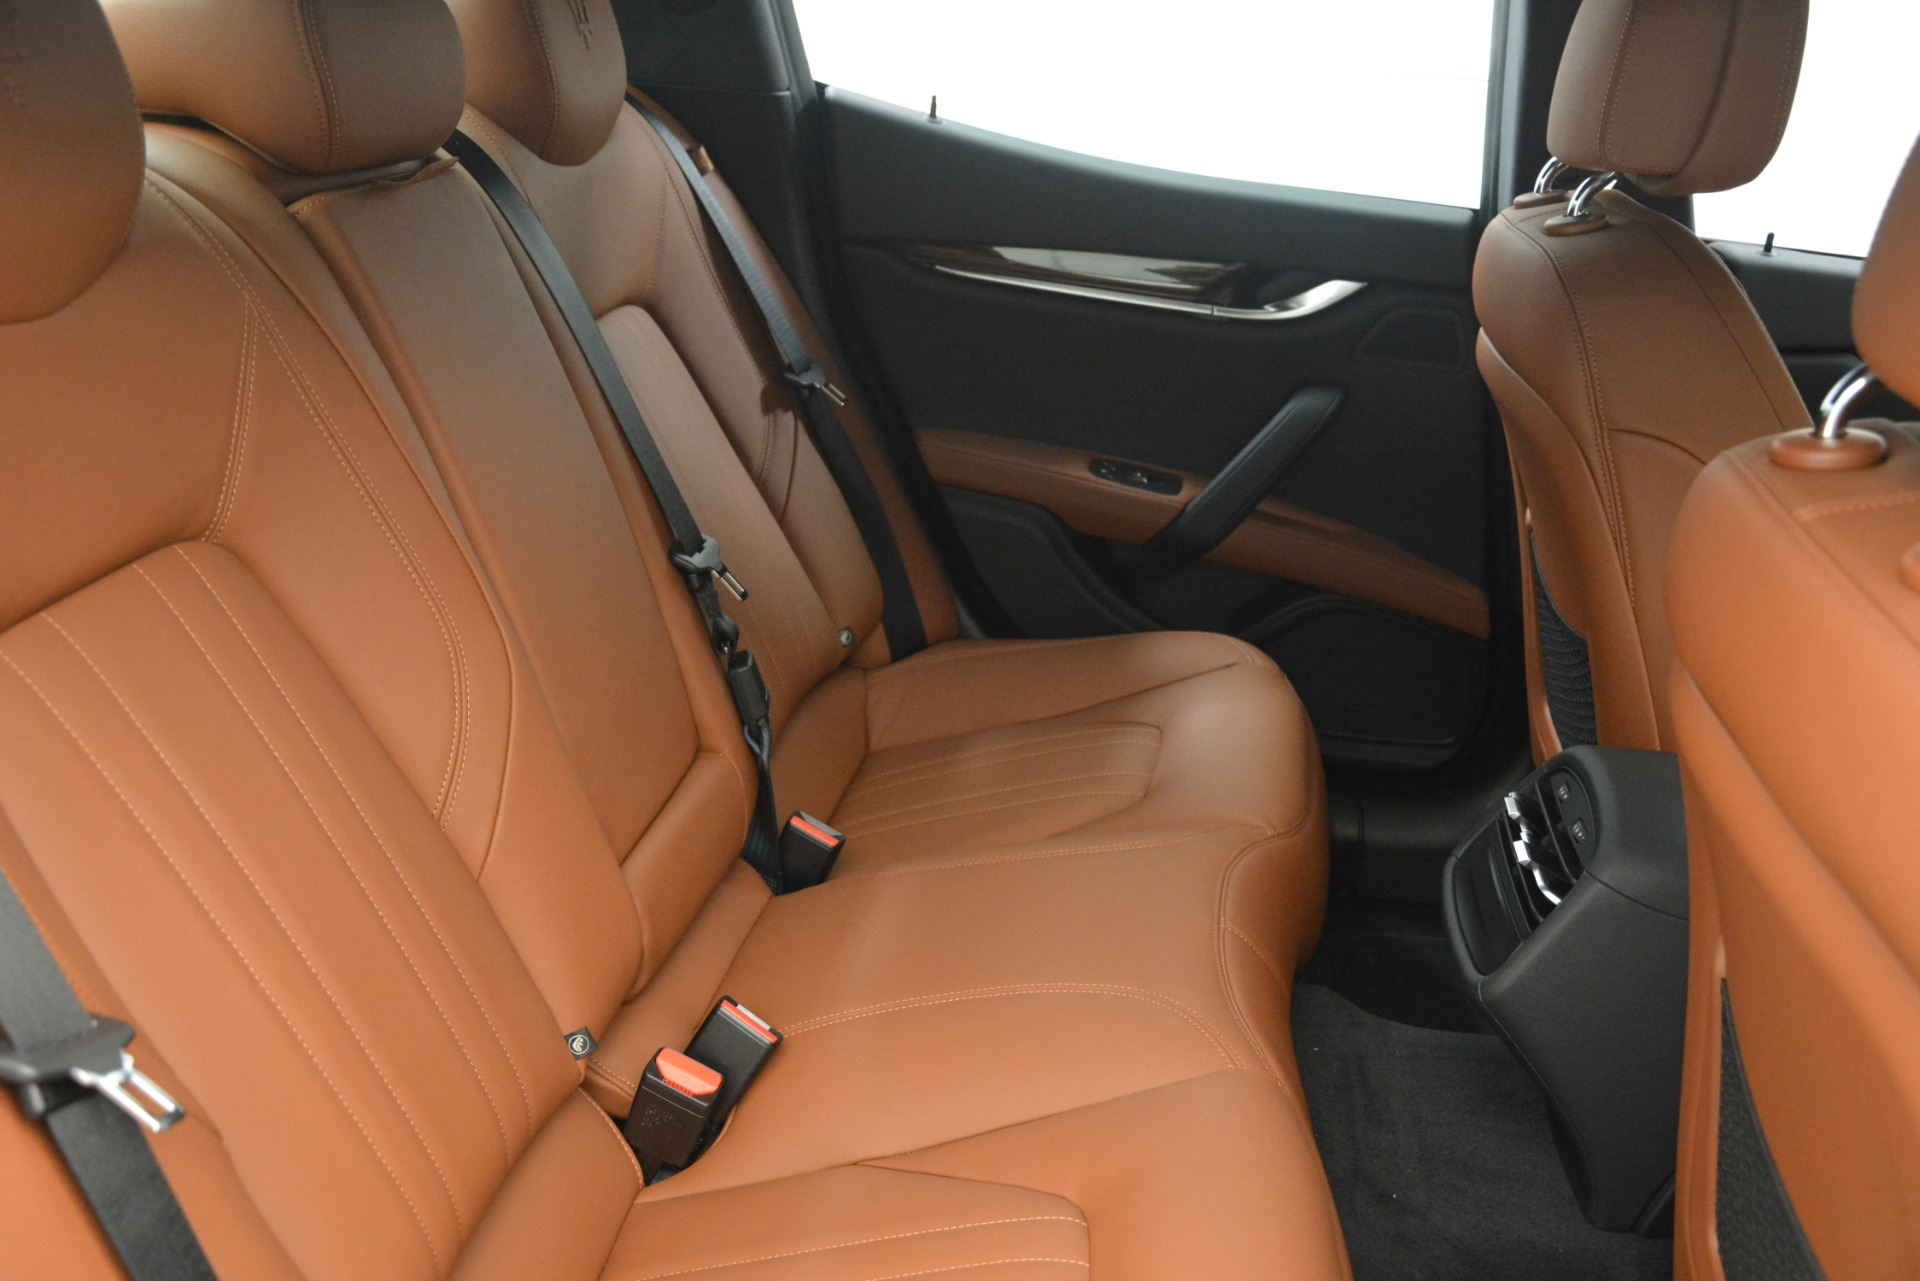 Used 2019 Maserati Ghibli S Q4 For Sale In Greenwich, CT 2585_p24